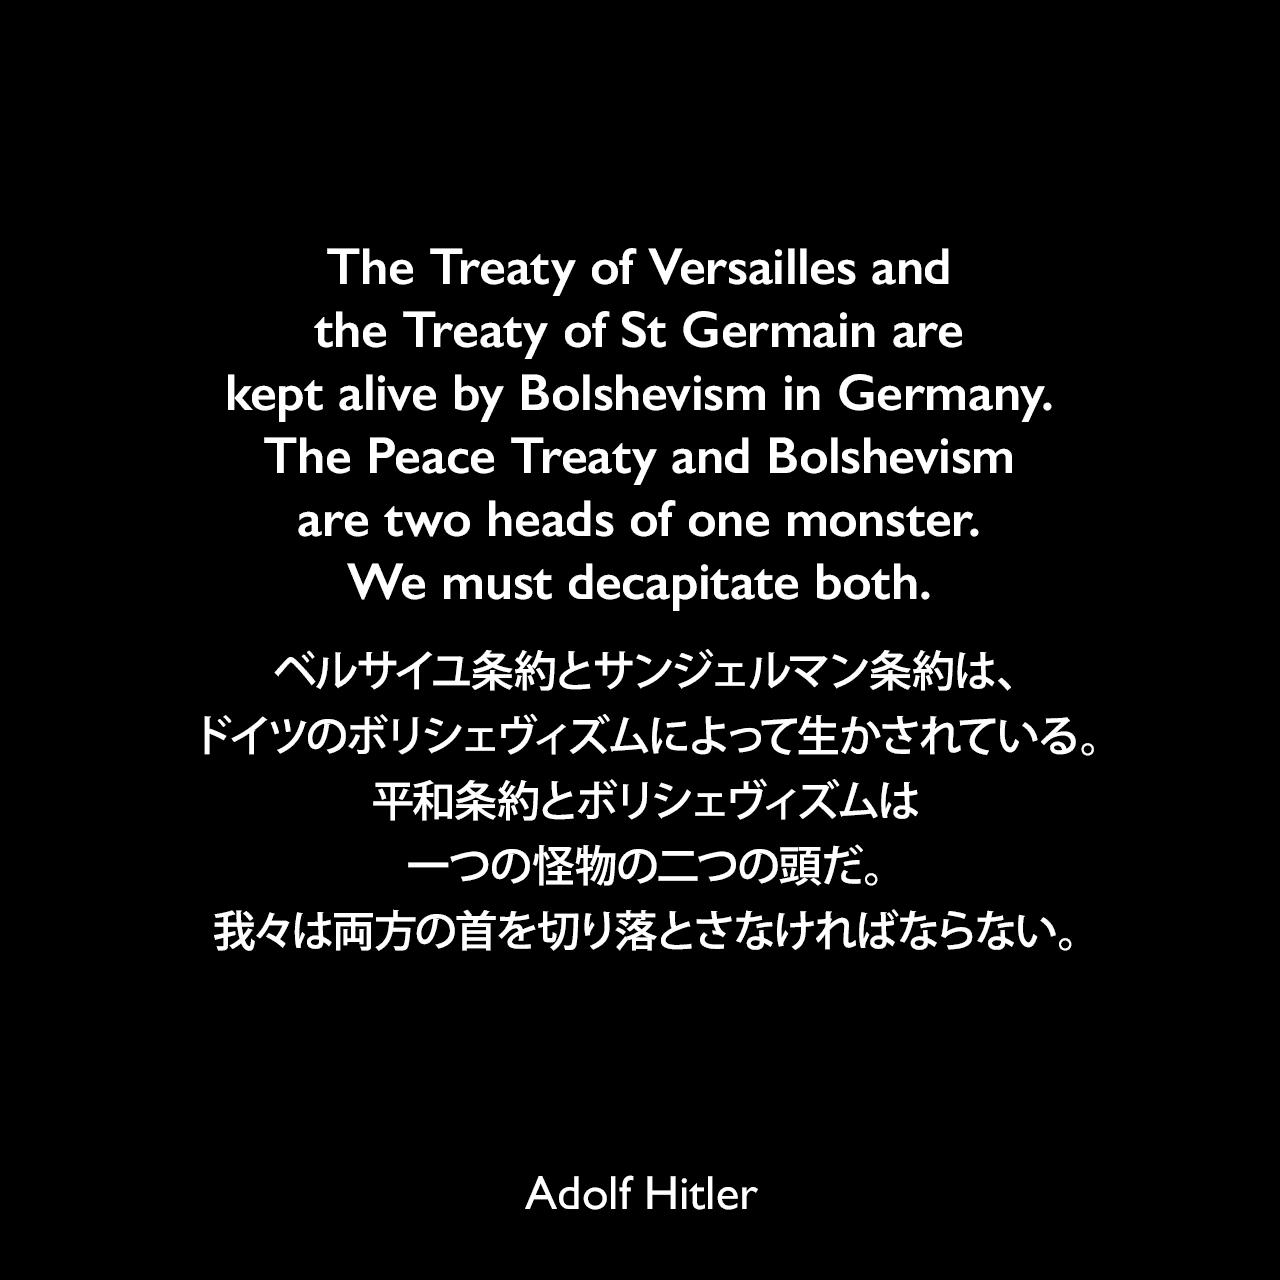 The Treaty of Versailles and the Treaty of St Germain are kept alive by Bolshevism in Germany. The Peace Treaty and Bolshevism are two heads of one monster. We must decapitate both.ベルサイユ条約とサンジェルマン条約は、ドイツのボリシェヴィズムによって生かされている。平和条約とボリシェヴィズムは一つの怪物の二つの頭だ。我々は両方の首を切り落とさなければならない。- 1923年 詩人ジョージ・シルヴェスター・ヴィエレックとのインタビューよりAdolf Hitler